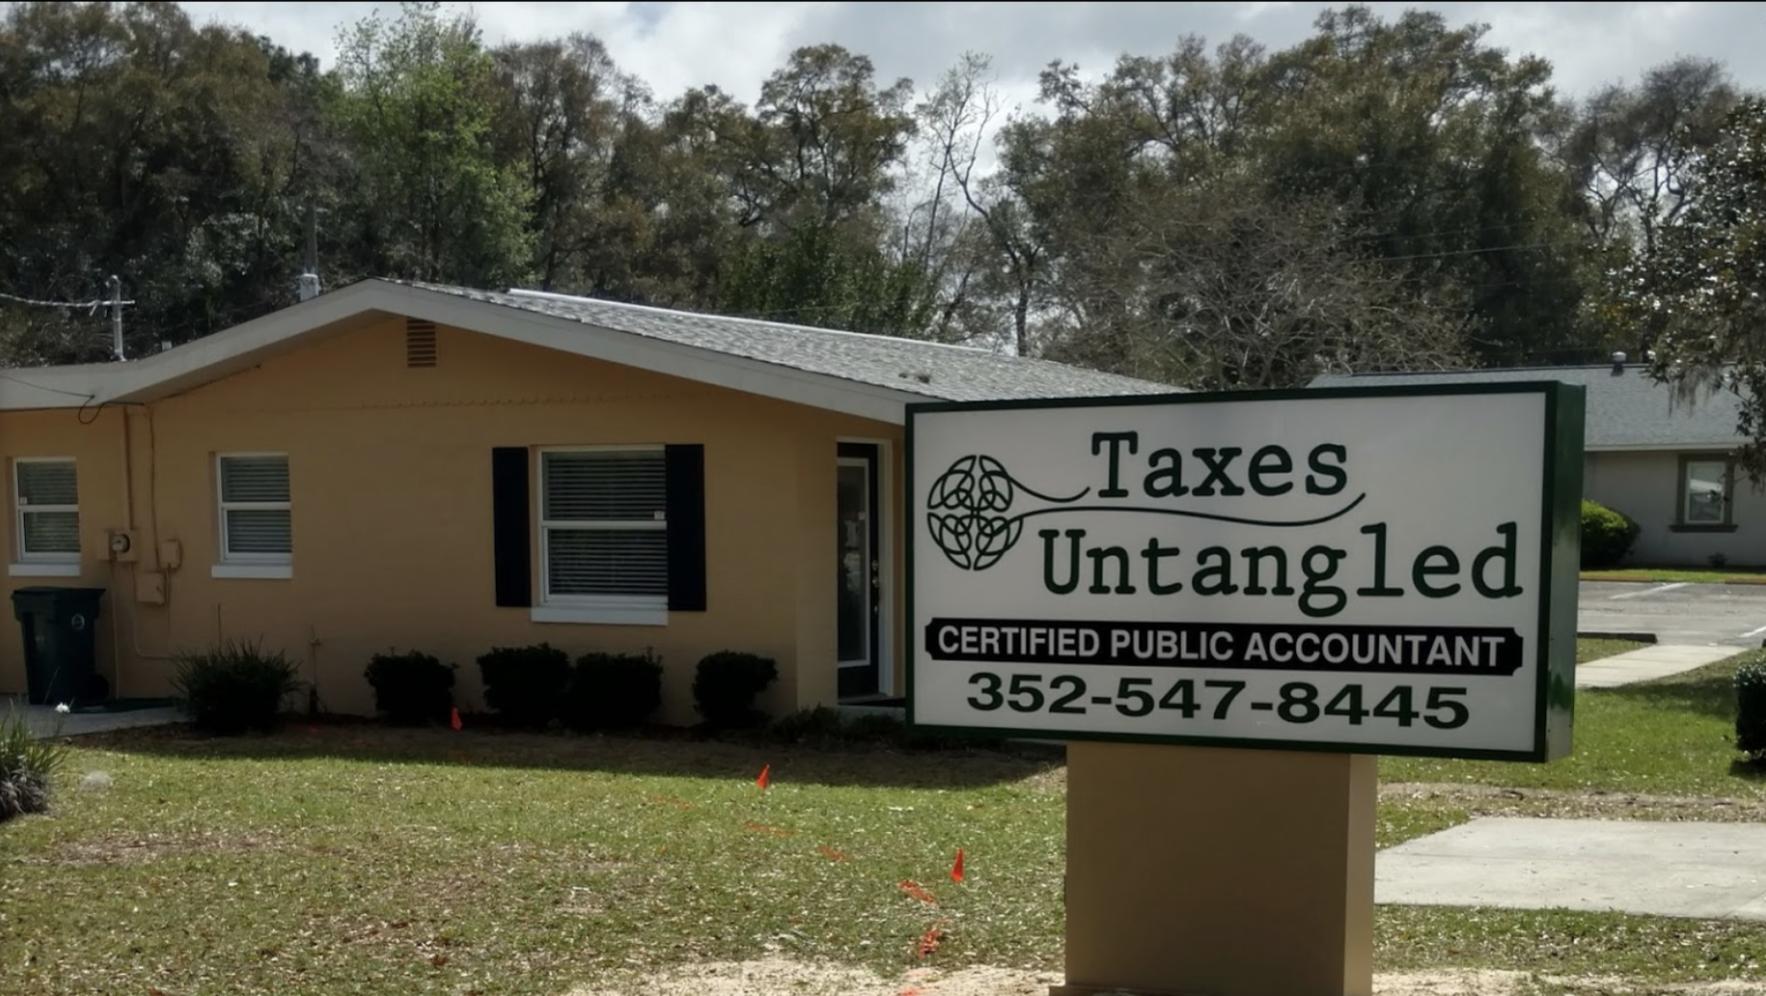 Taxes Untangled, Inc image 0